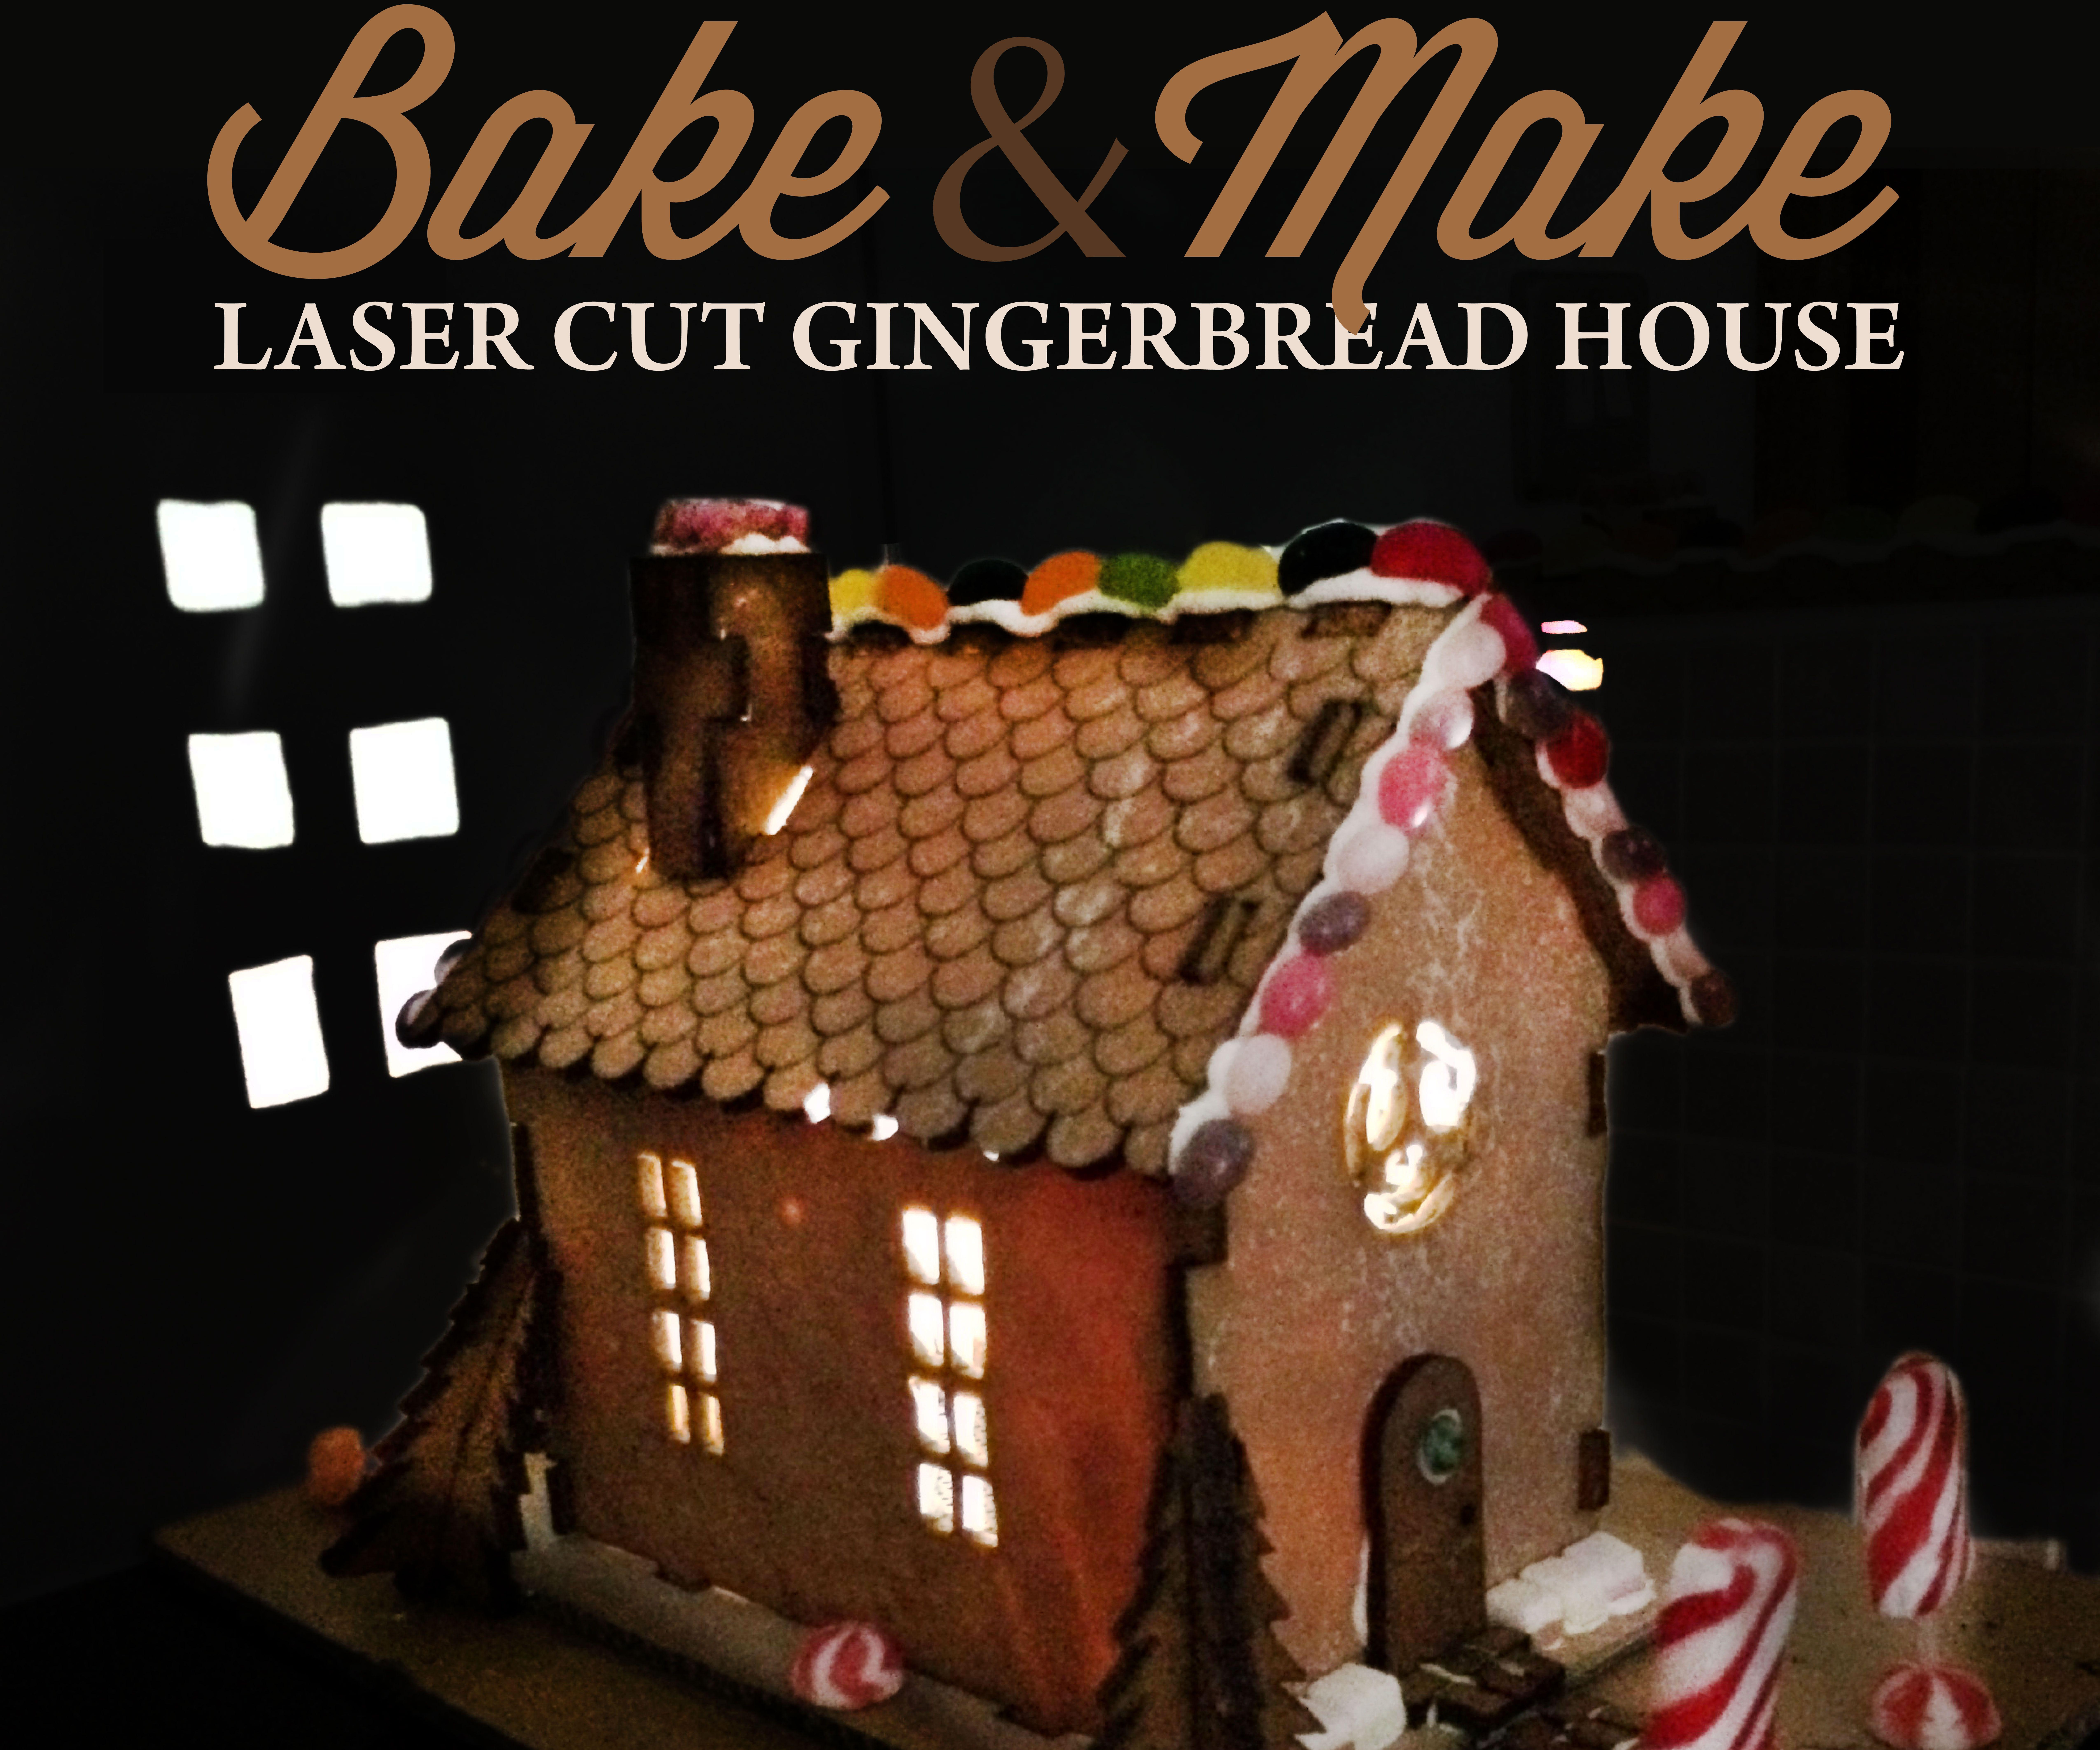 Bake & Make: Laser Cut Gingerbread House